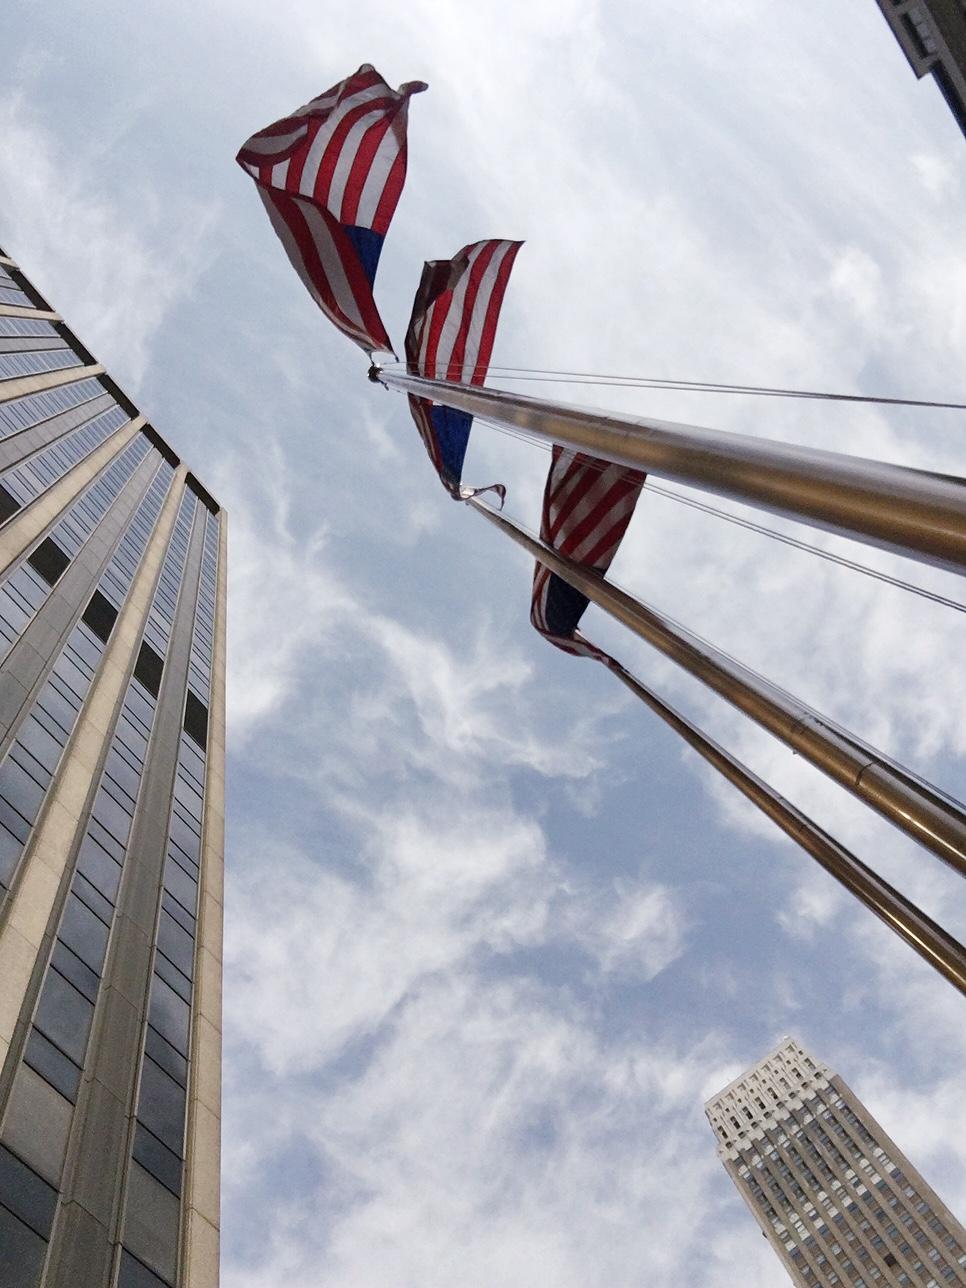 New York Fashion Week Diary : American Flags outside One Penn Plaza